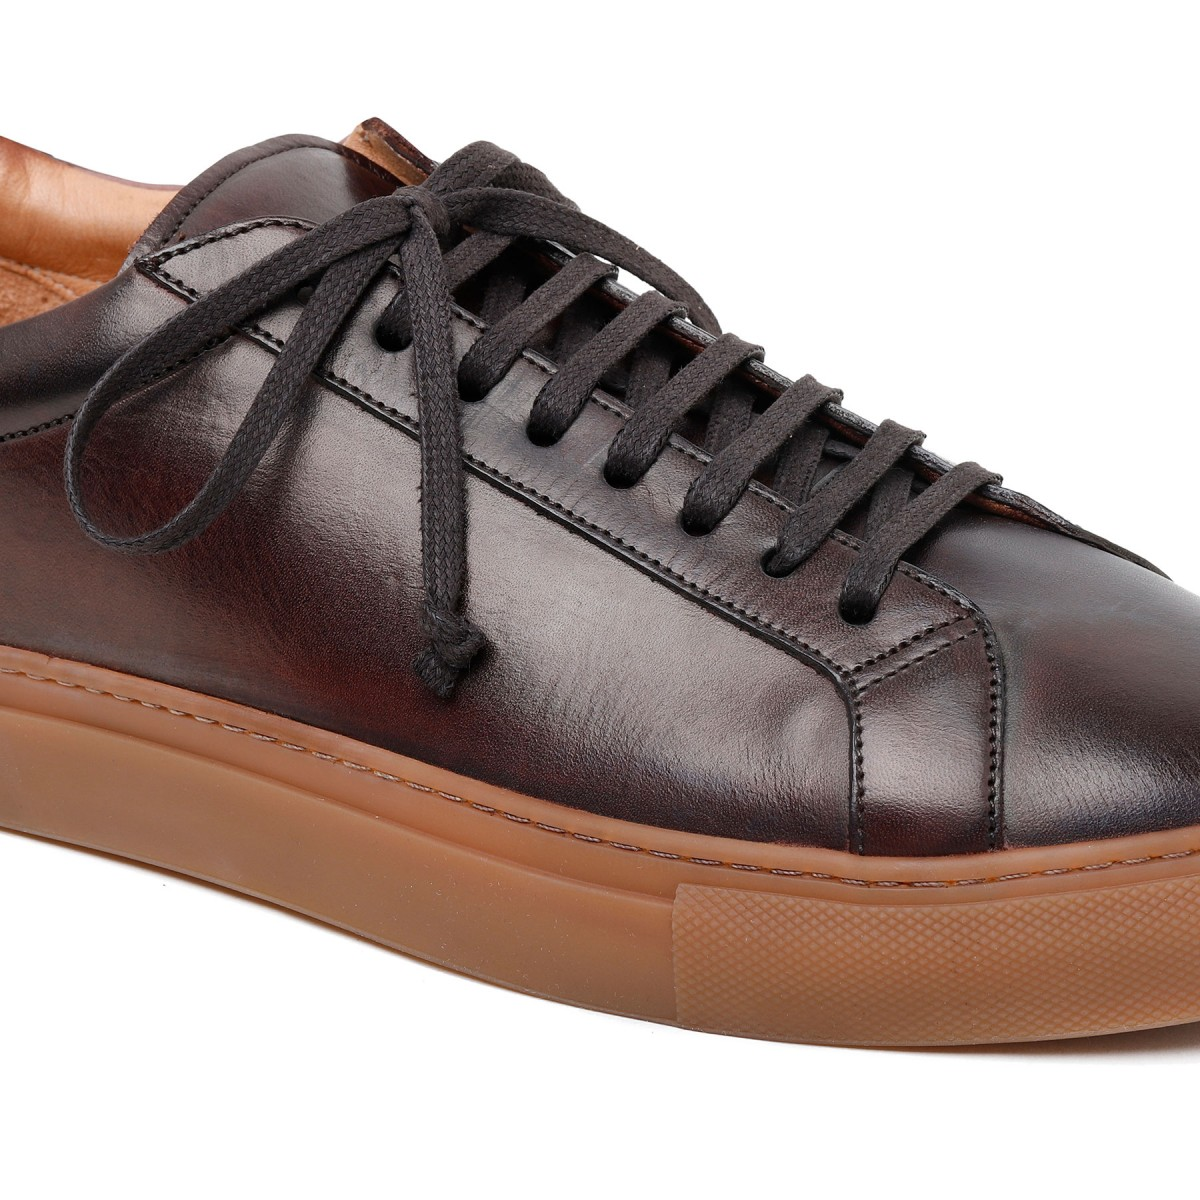 Romilly dark brown leather sneakers